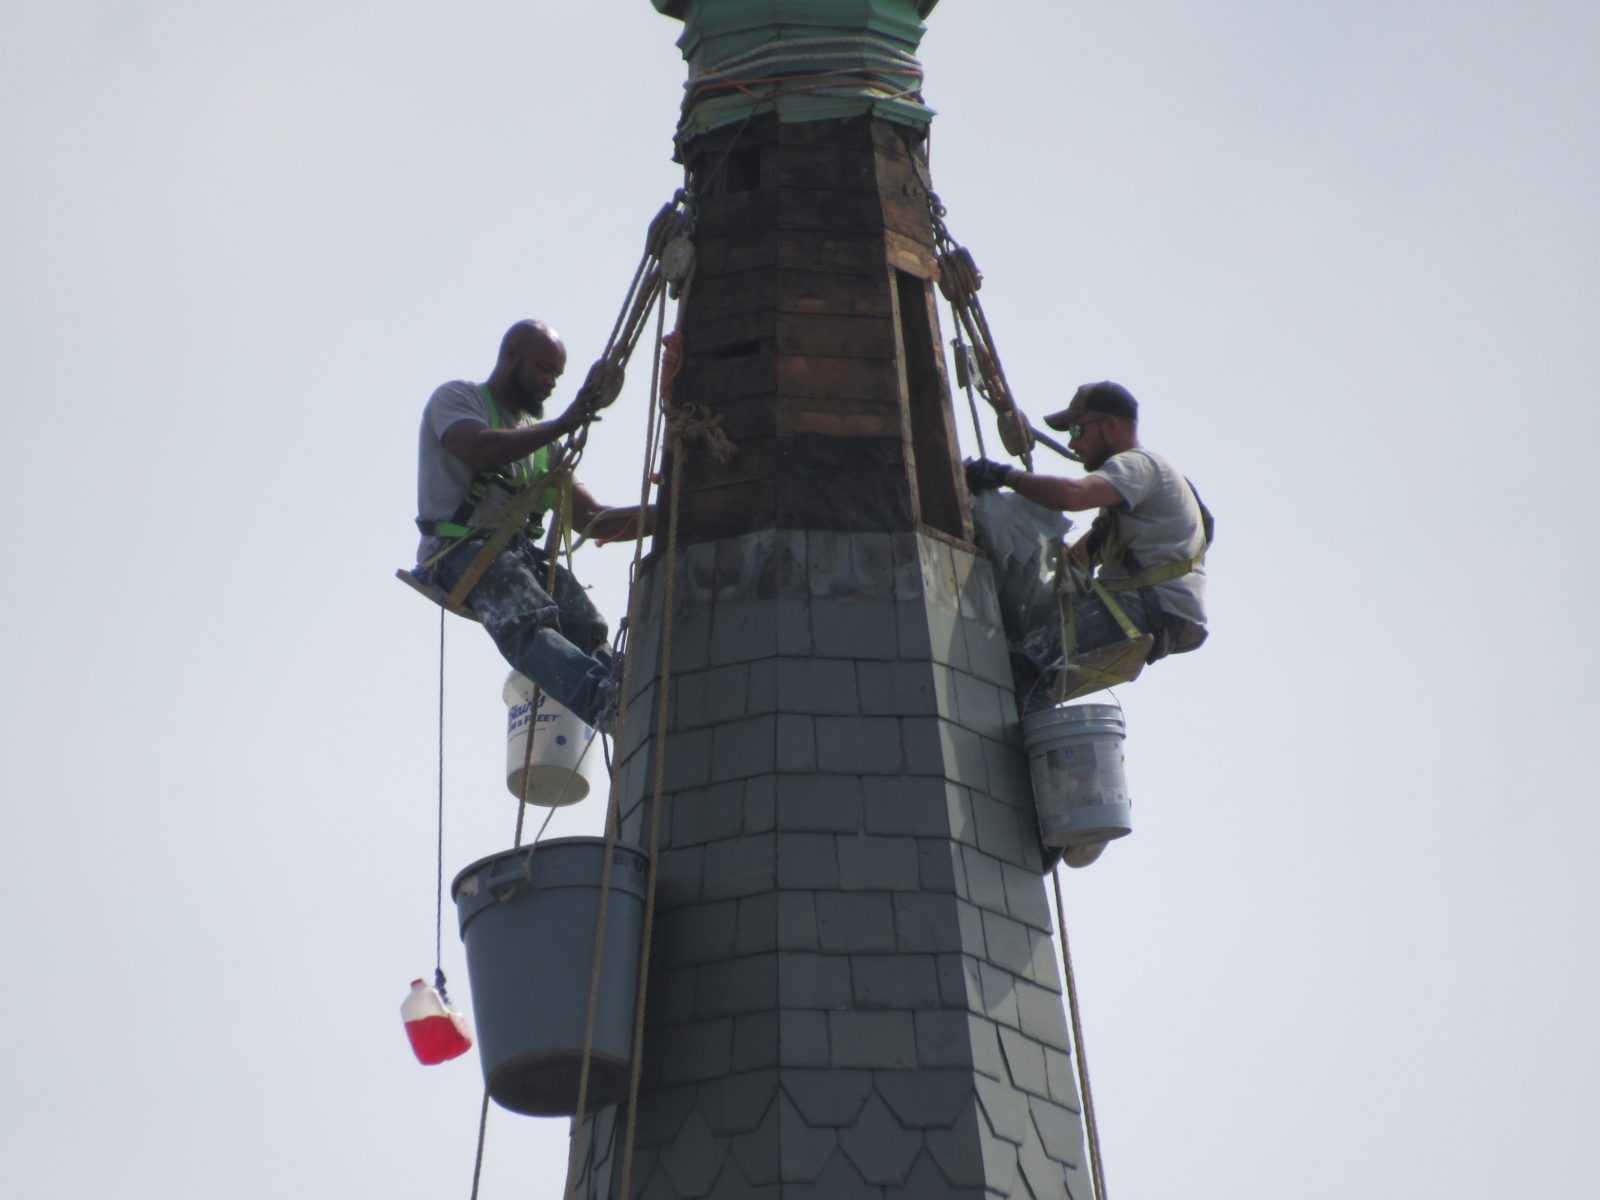 Steeple roofing contractor